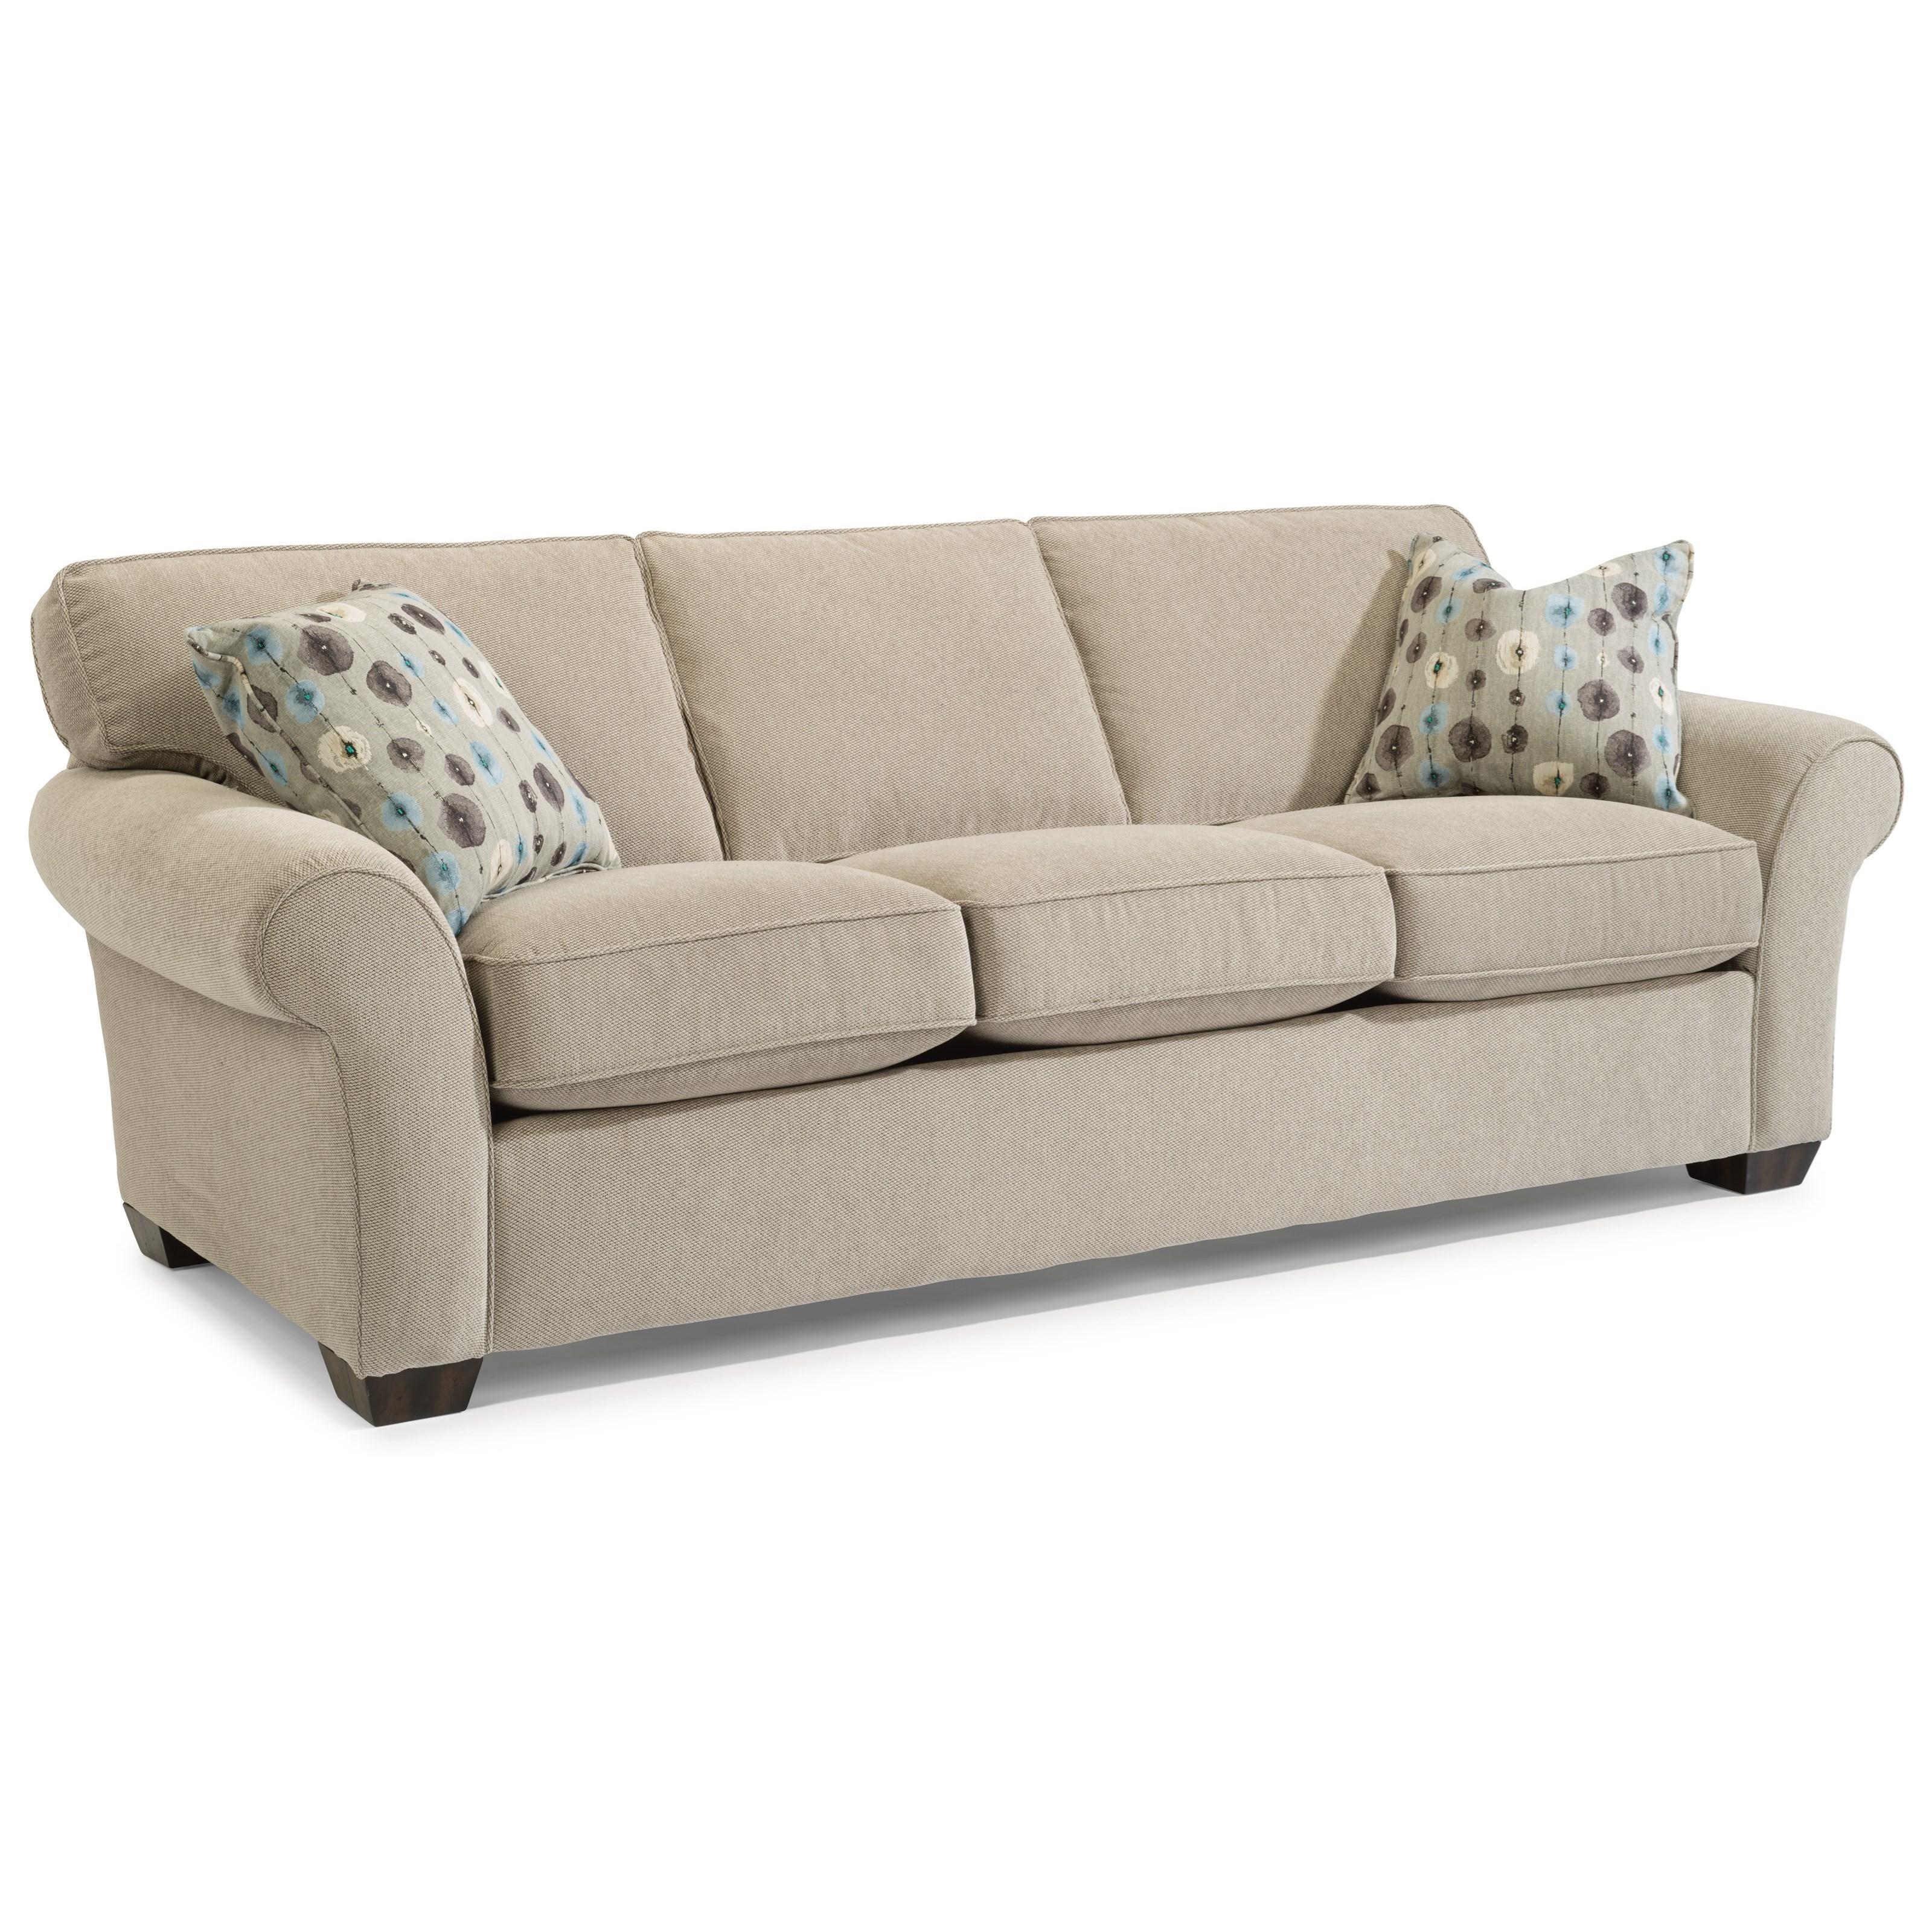 Flexsteel Vail Sofa Price